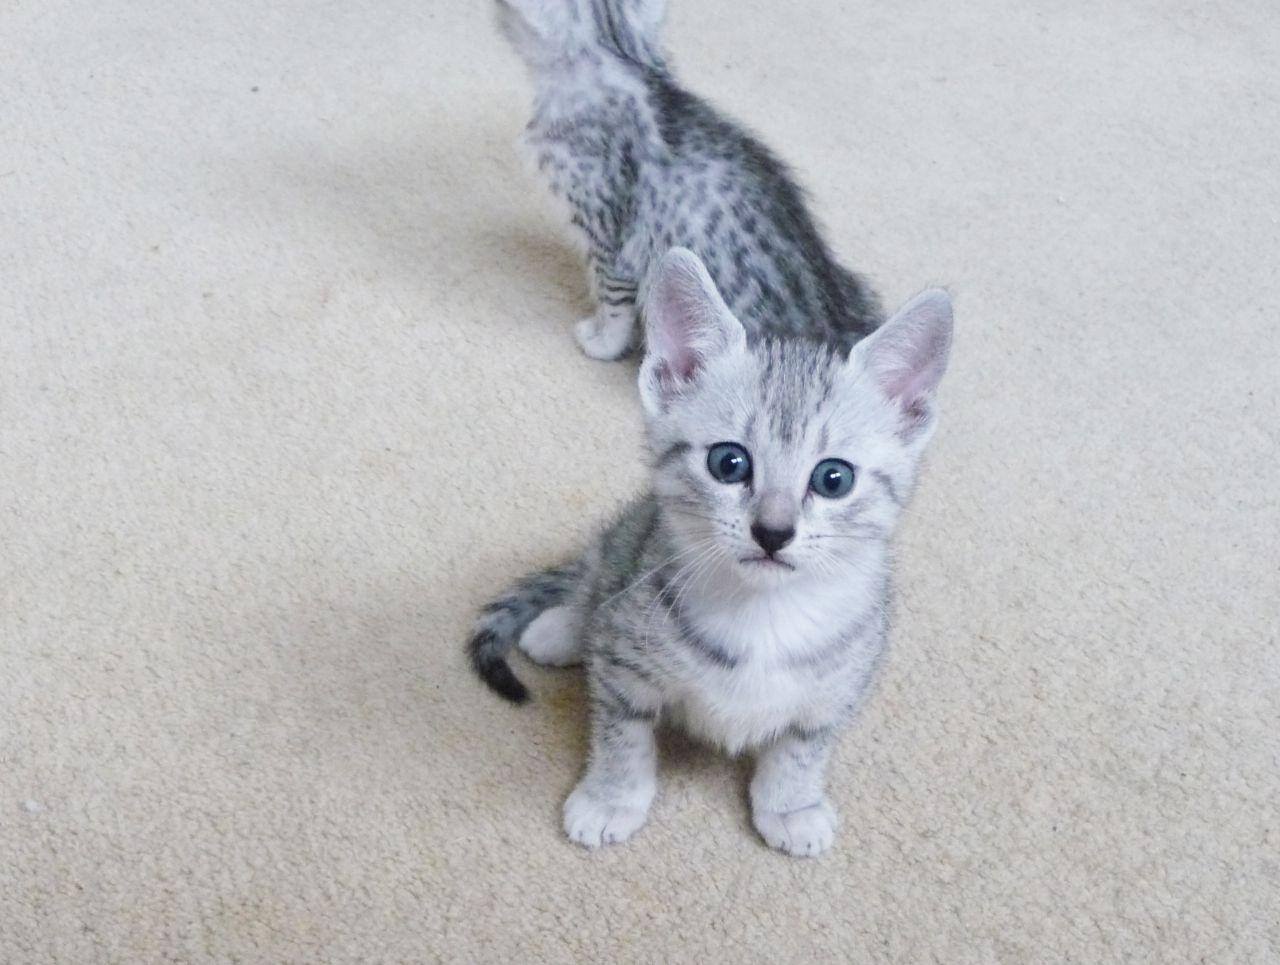 Egyptian Mau Kitten: Egyptian Beautiful Pedigree Egyptian Mau Kittens For Sale Swindon Breed